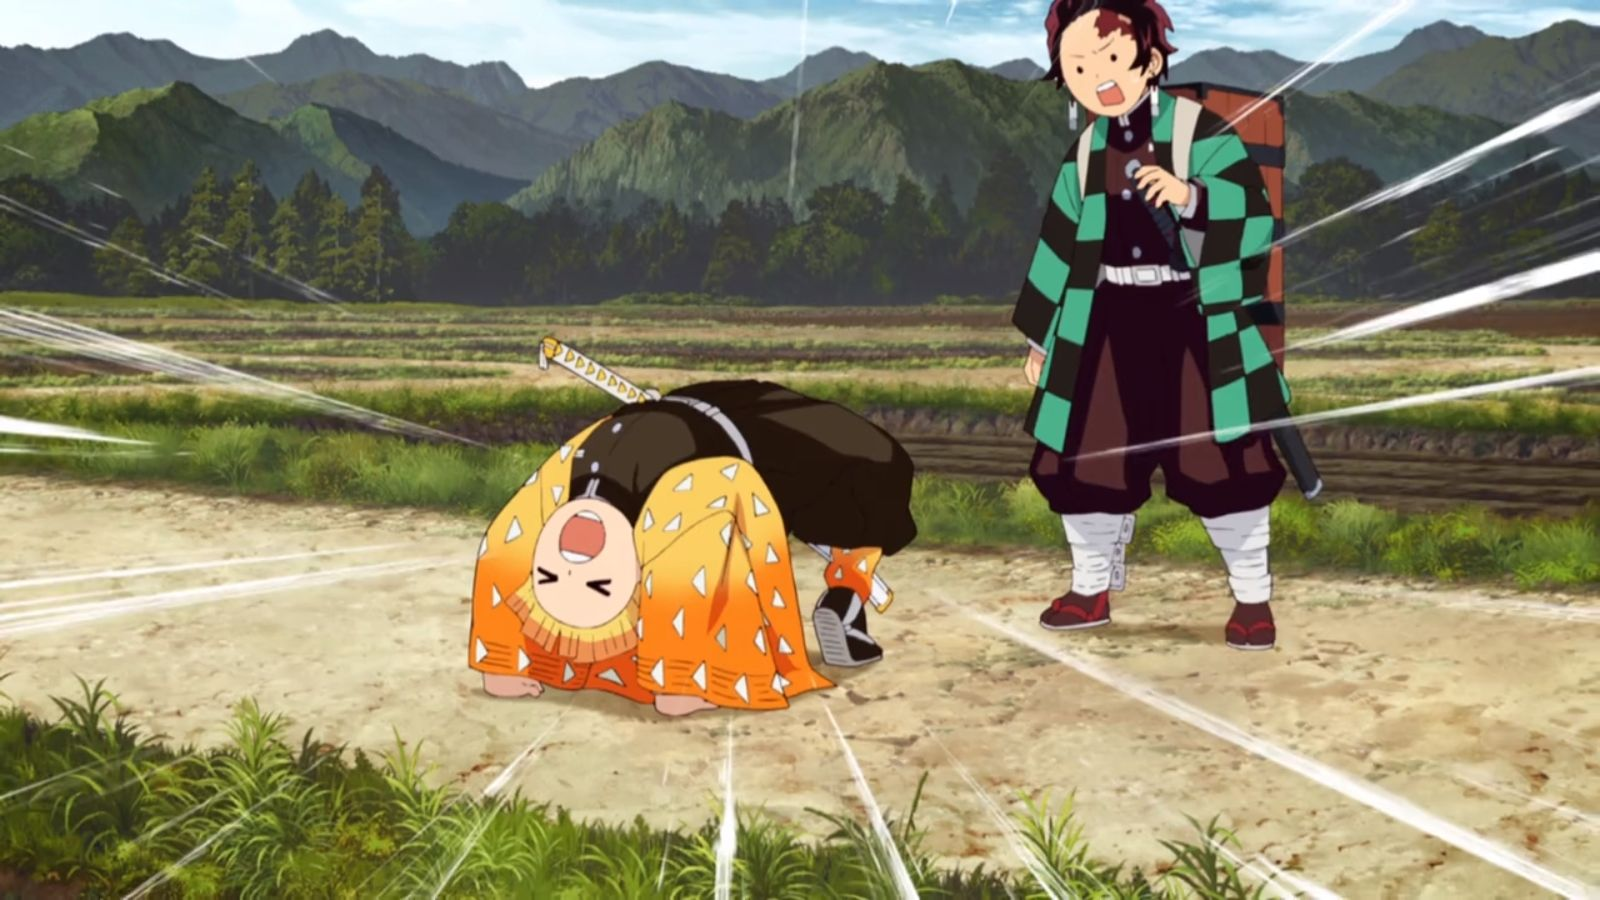 Demon Slayer: Kimetsu No Yaiba Episode 11: The Monster's House in the Woods — - I drink and watch anime | Slayer, Slayer meme, Anime demon